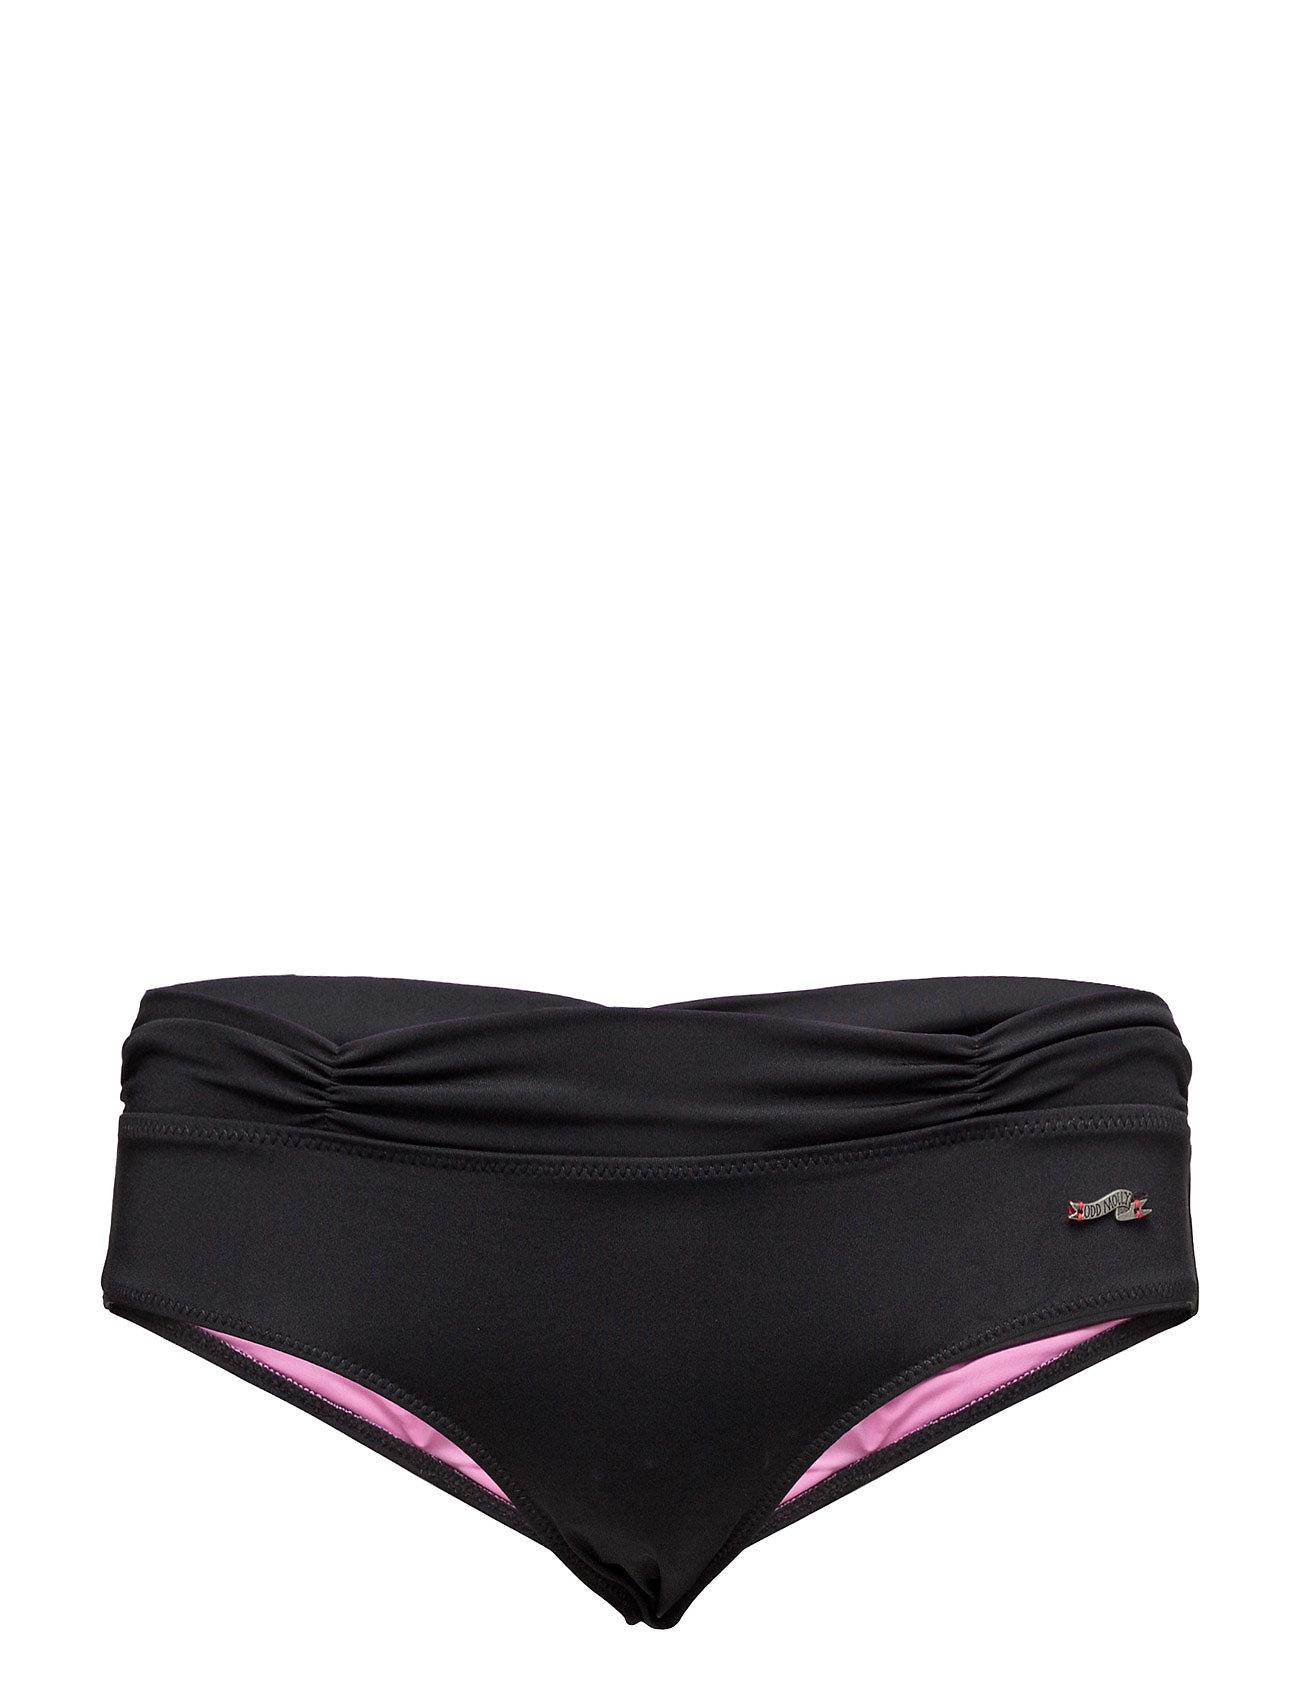 Whale hello there bikini btm fra odd molly underwear & swimwear på boozt.com dk